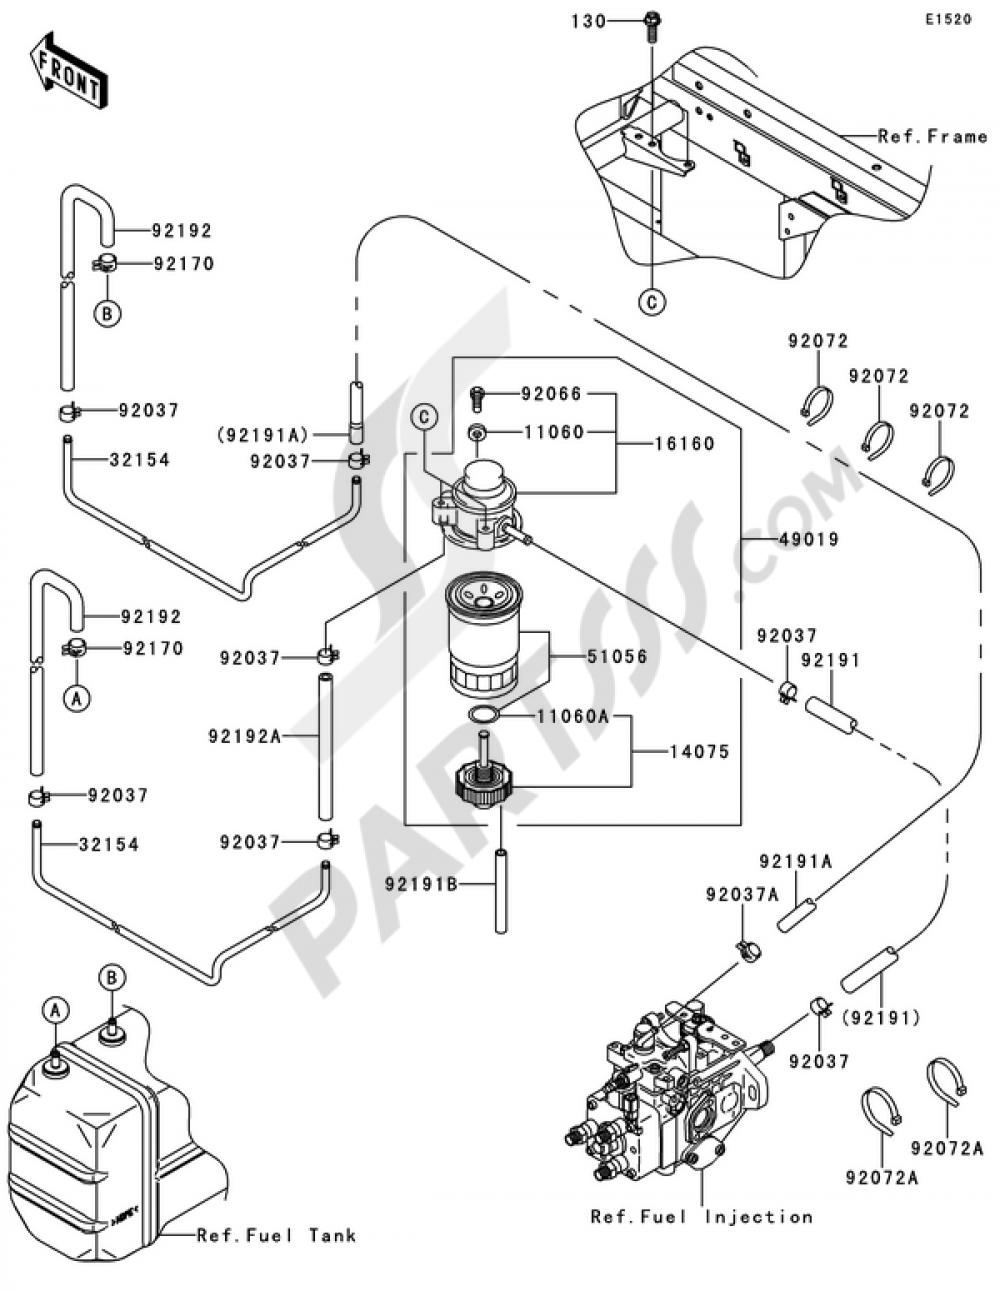 fuel pump kawasaki mule 4010 trans 4x4 diesel 2009  partsss